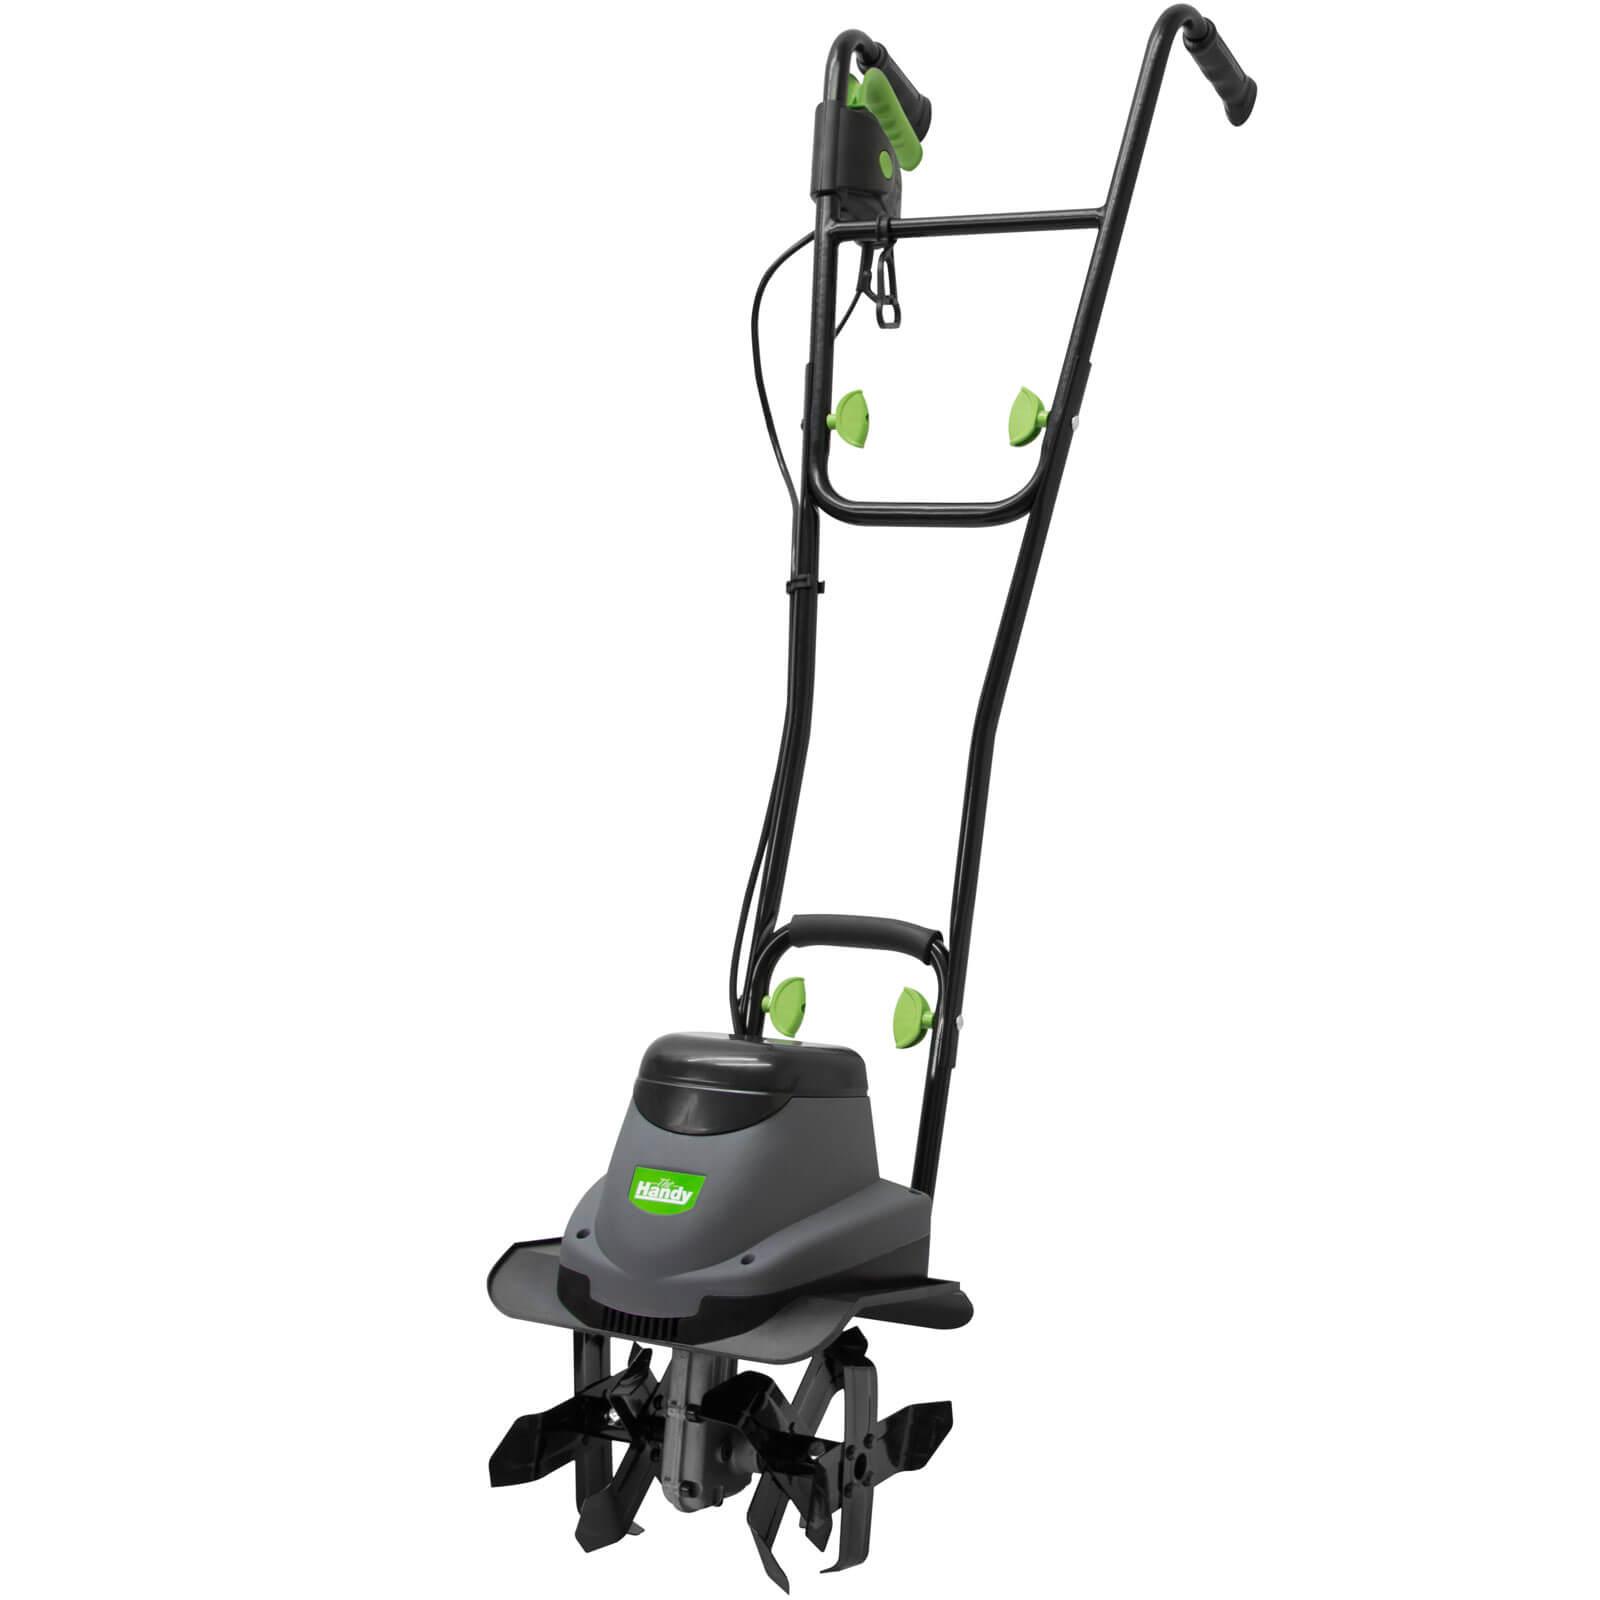 Handy Electric Garden Tiller 300mm Wide 800w 240v